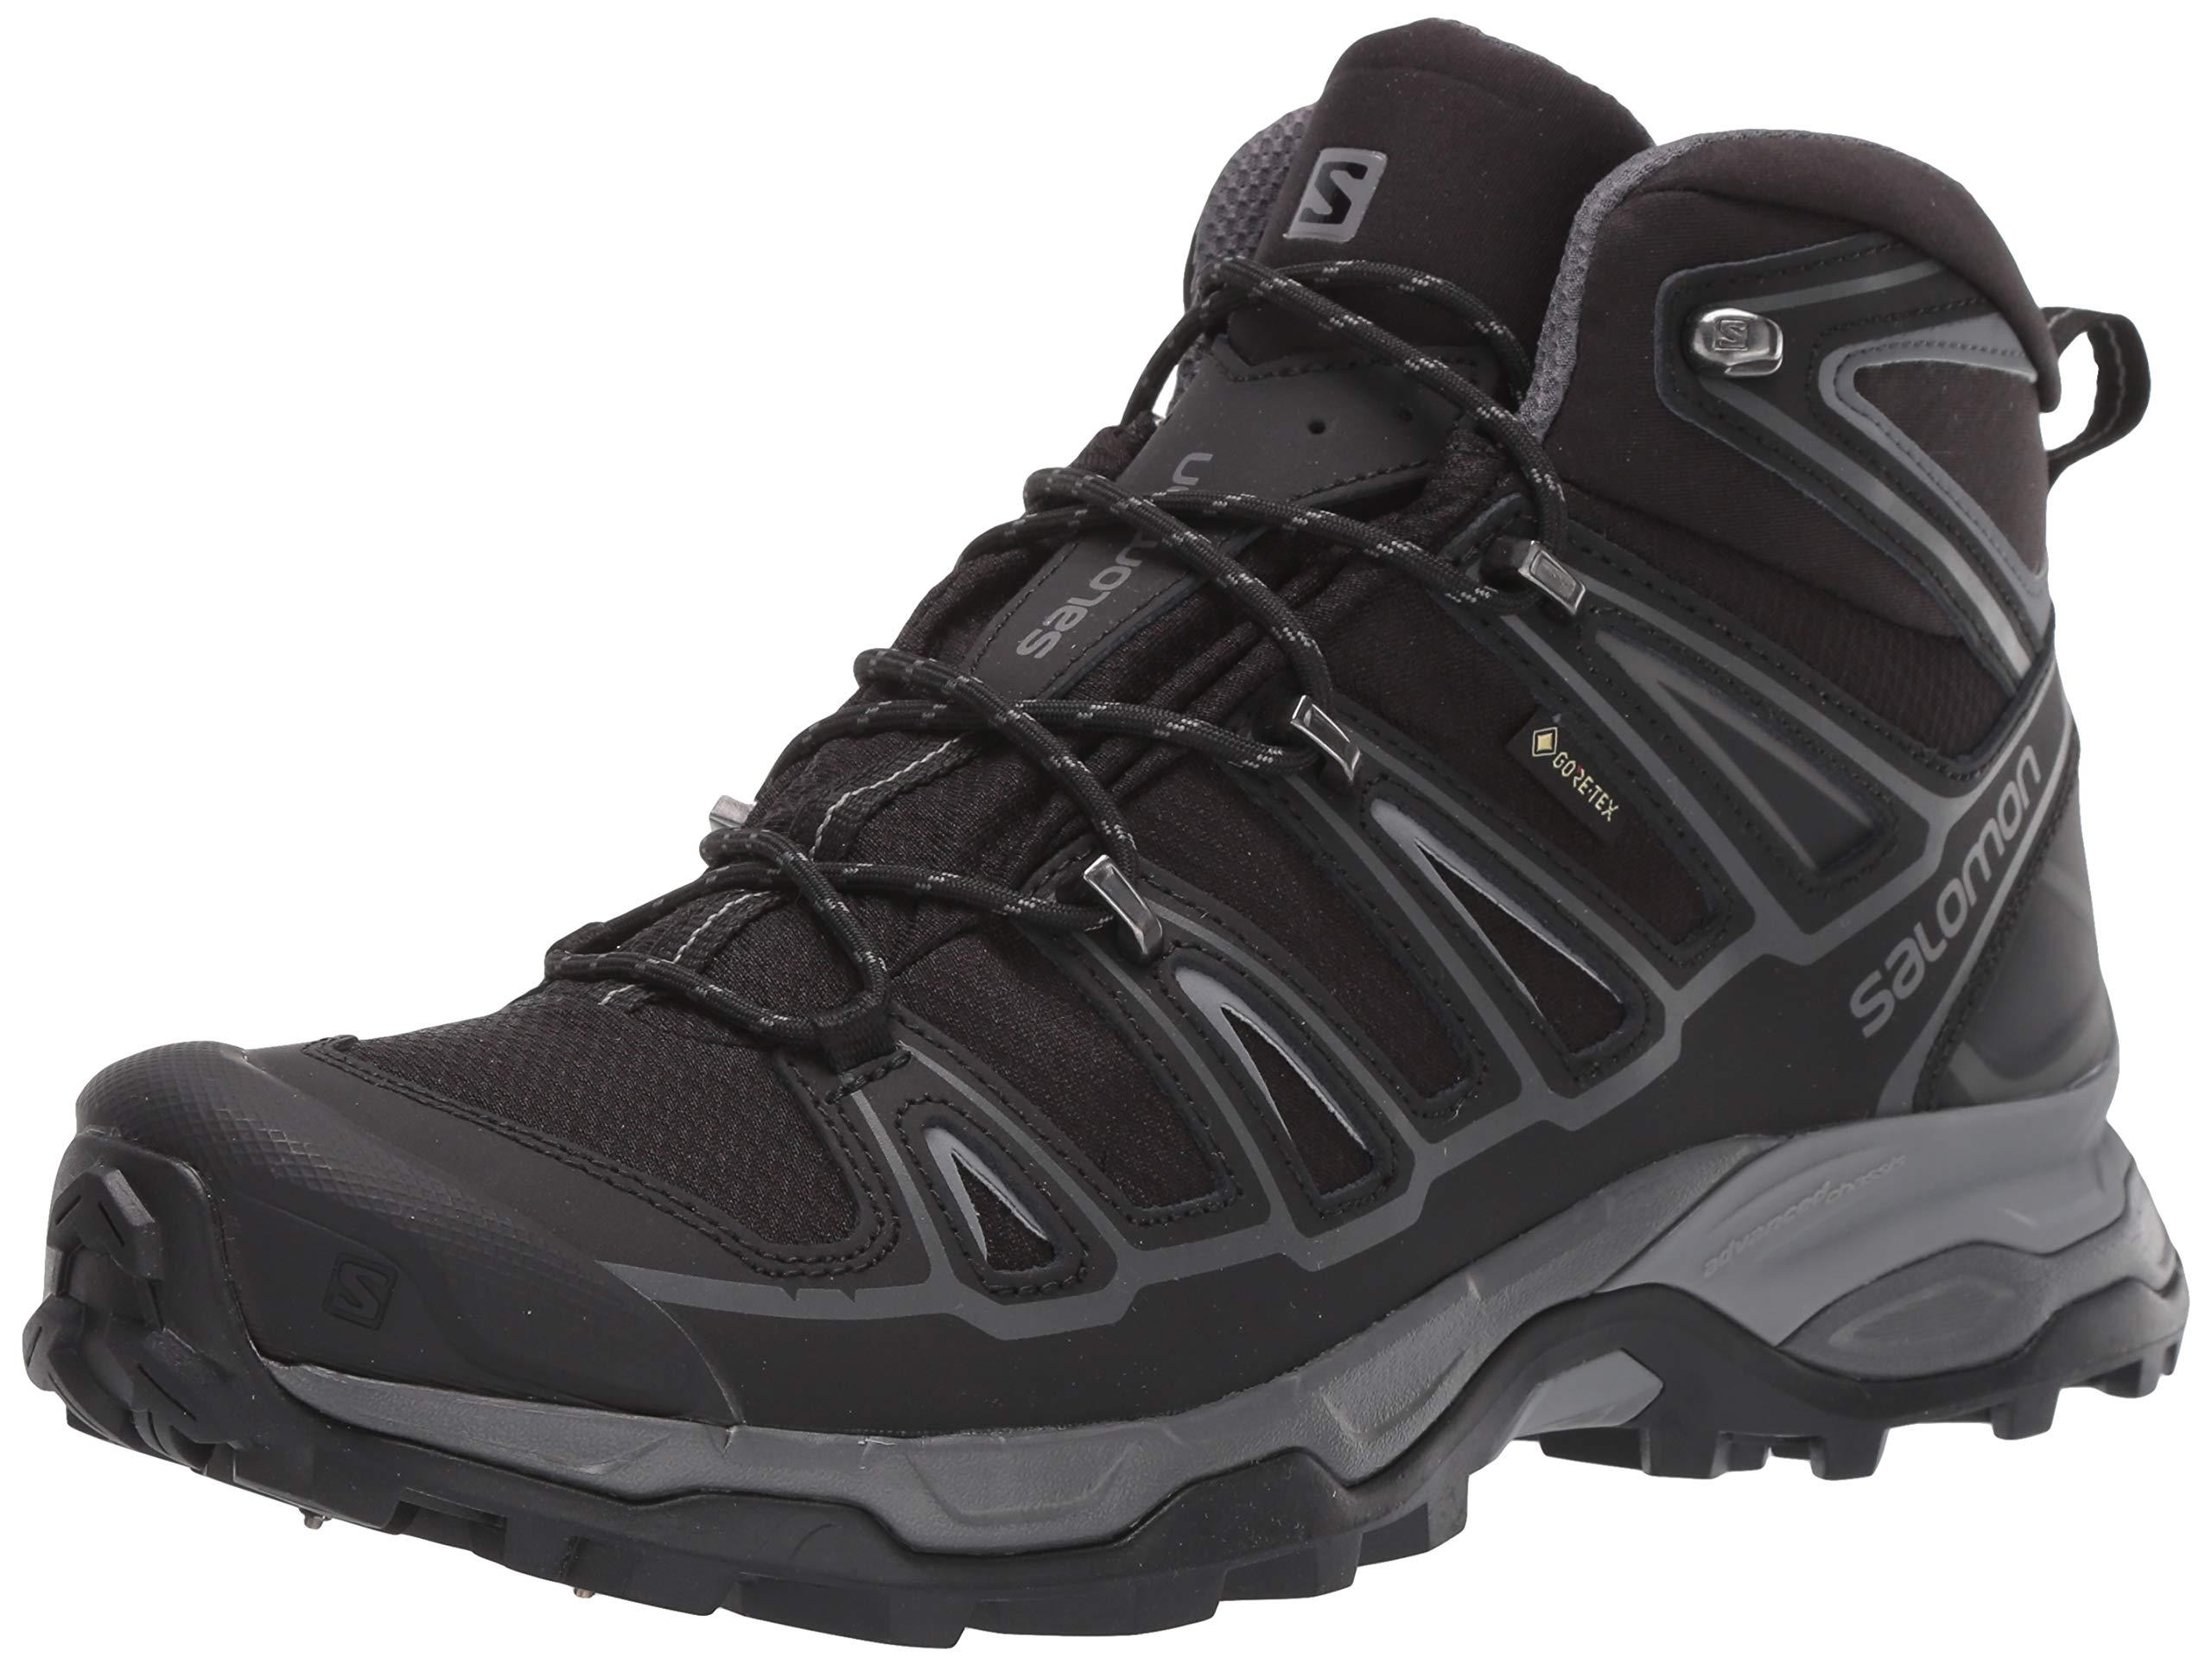 Salomon Men's X Ultra Mid 2 Spikes GTX Snow Boots